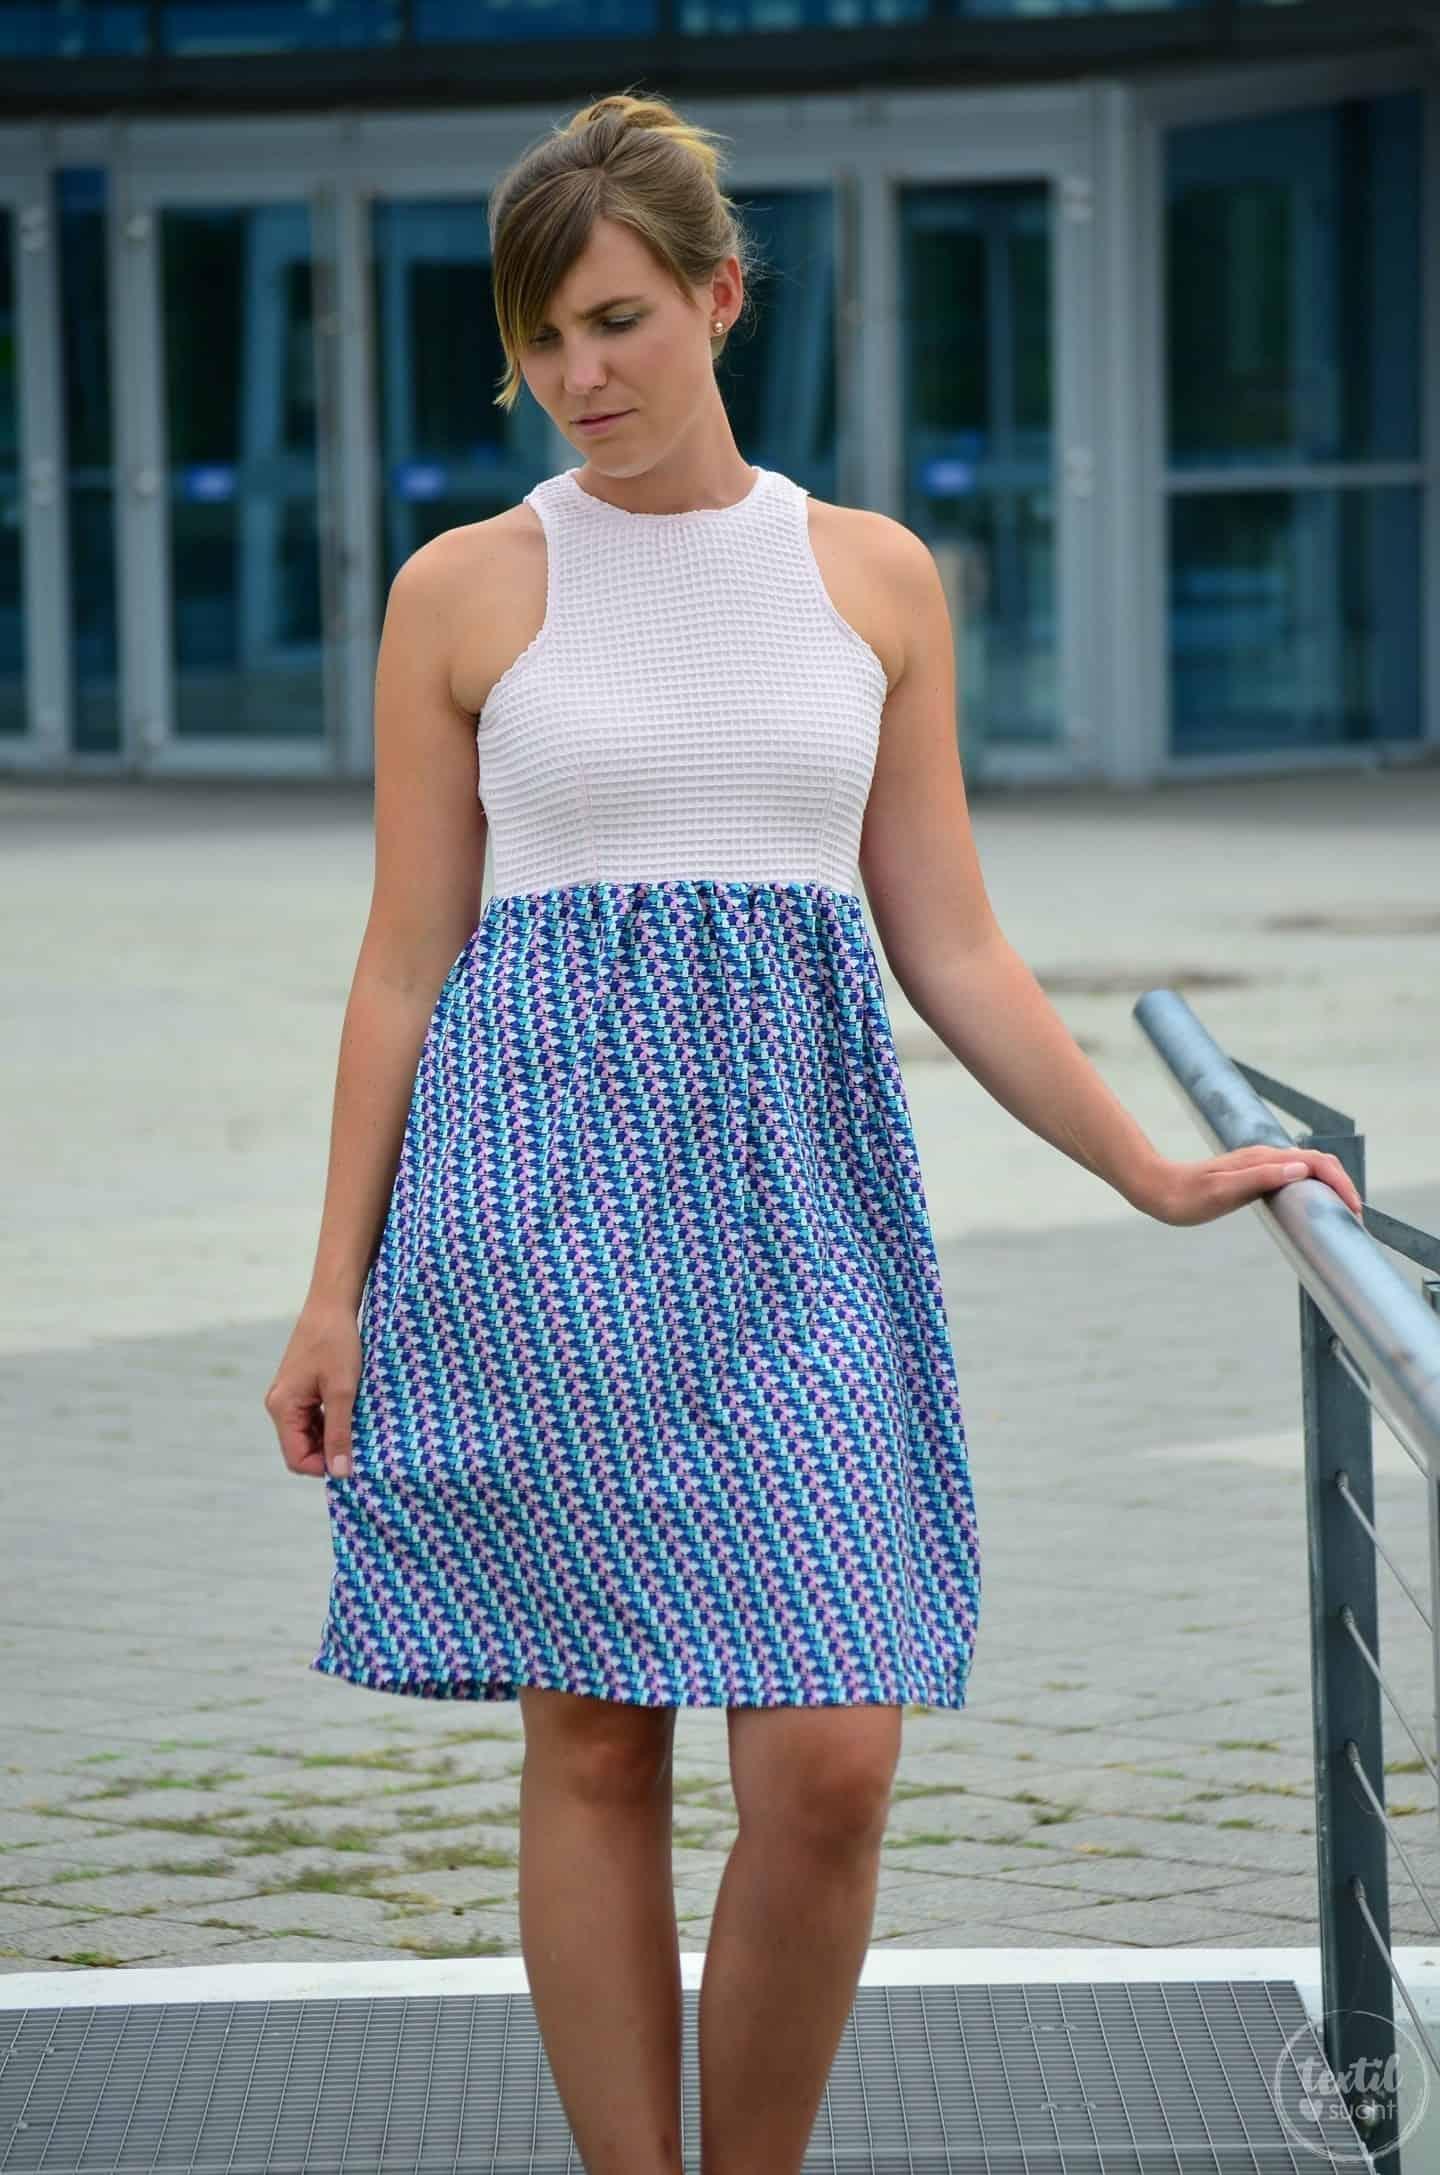 sommerkleid nähen: kleid kelani aus webware » textilsucht®